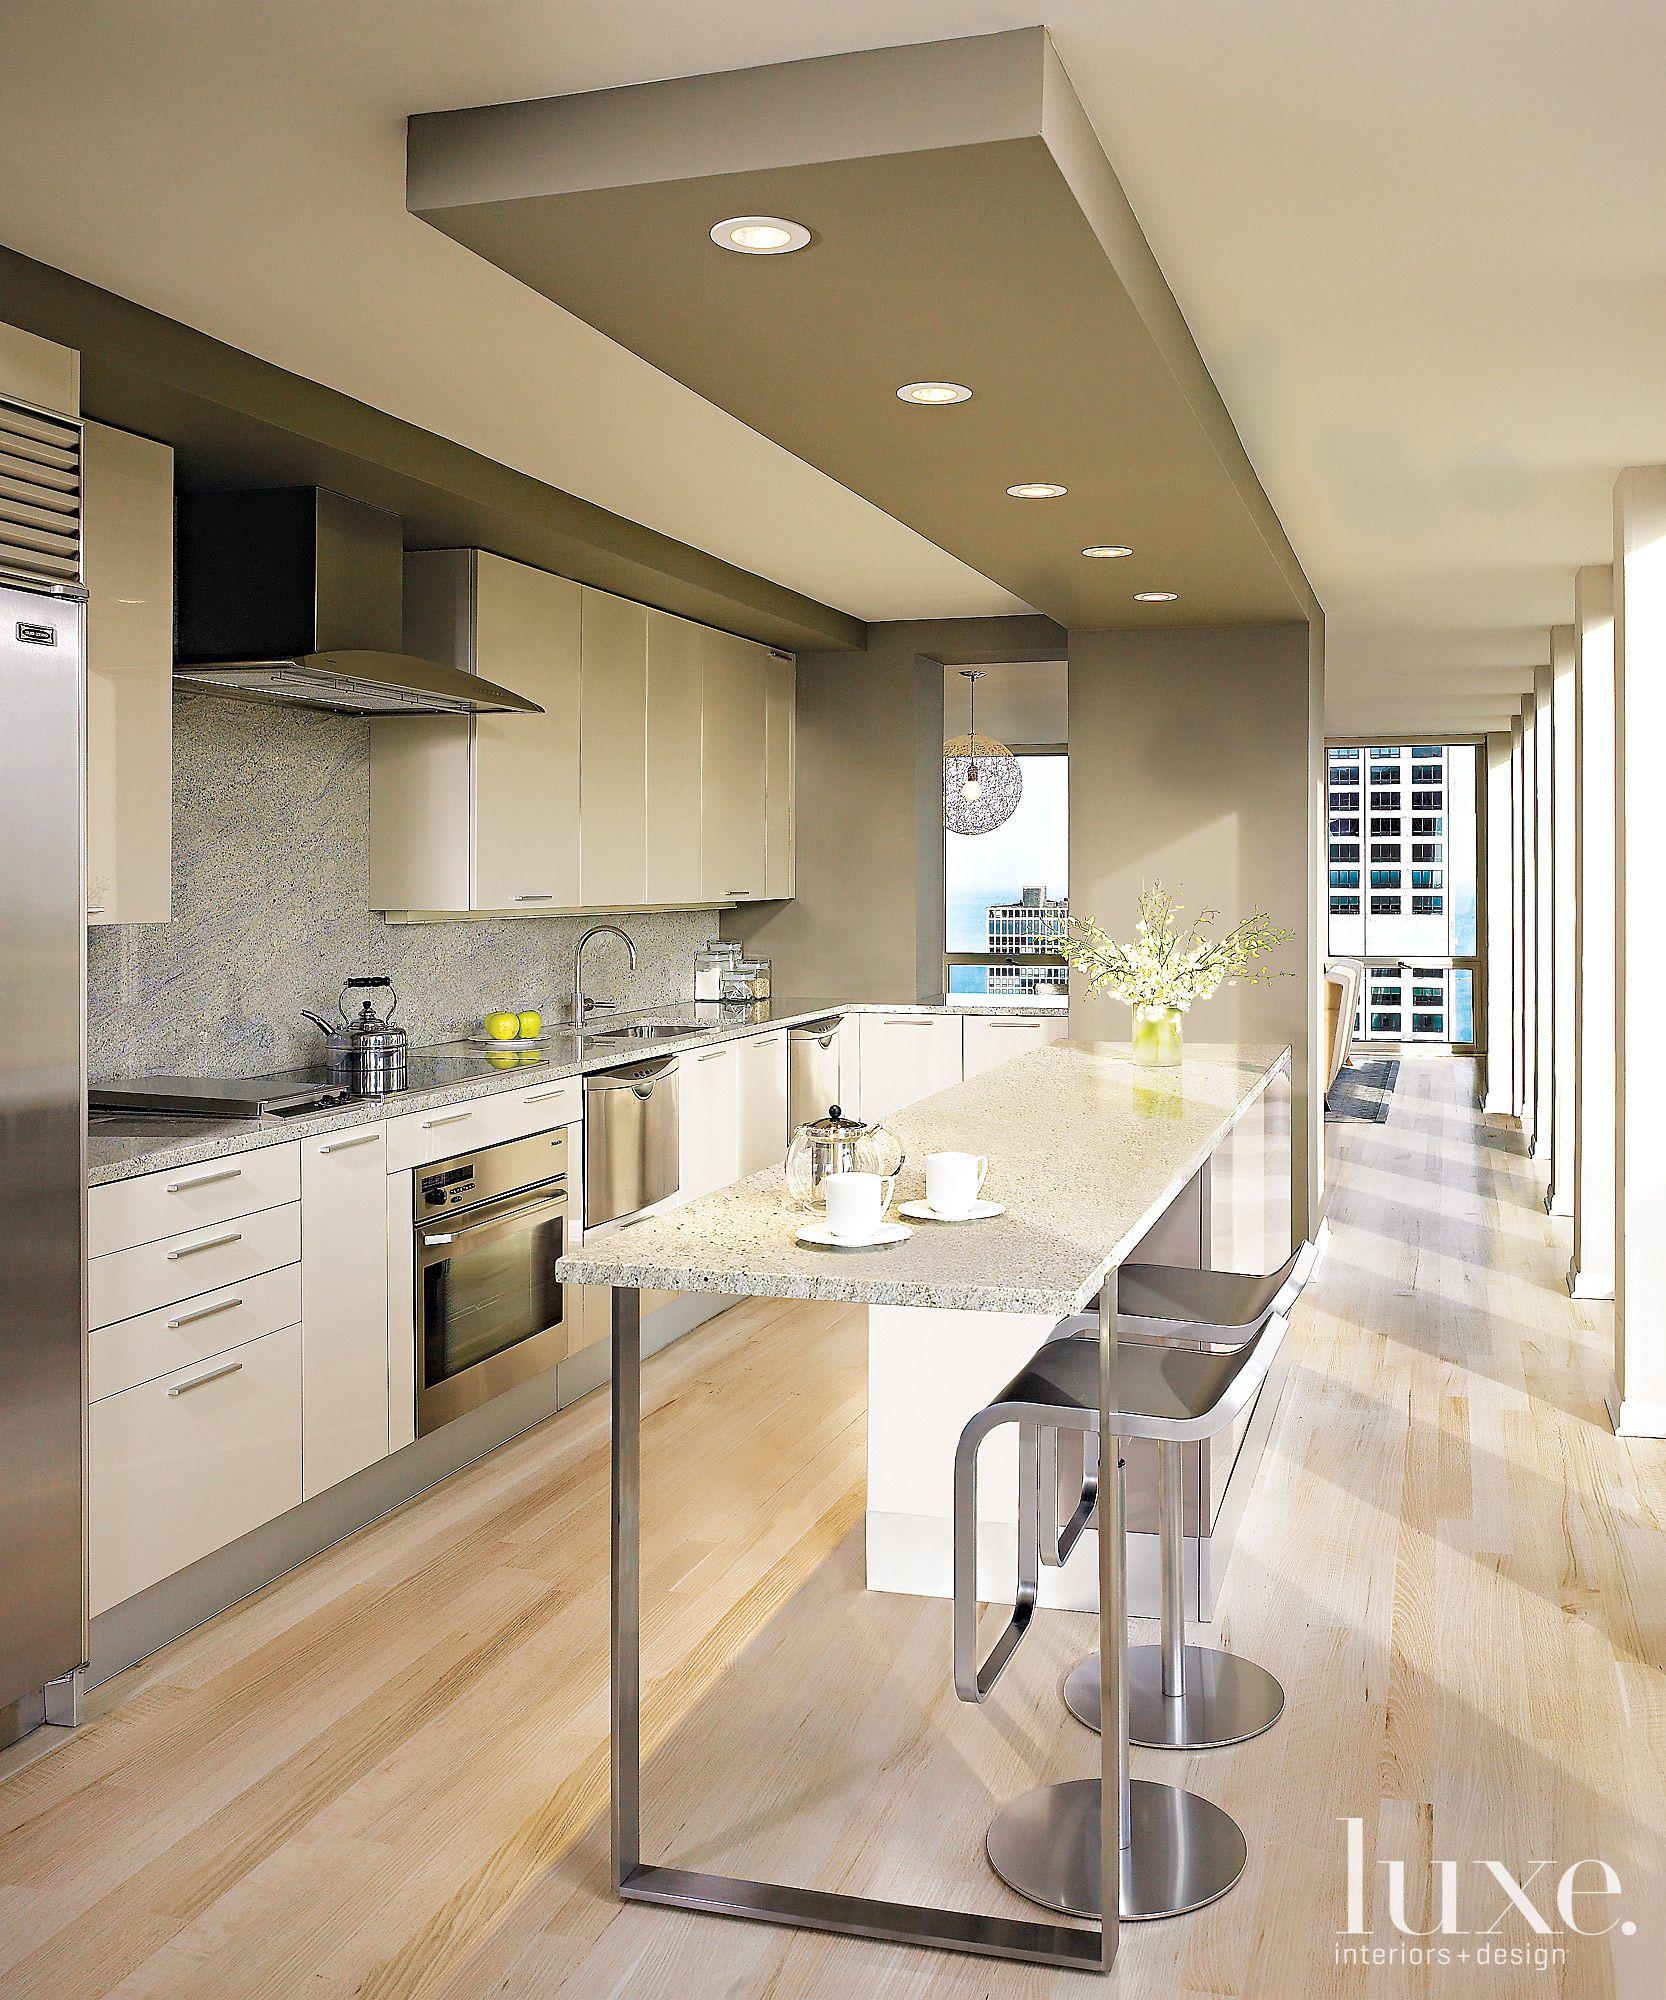 A beautiful kitchen | design, interior design, home decor, luxury ...